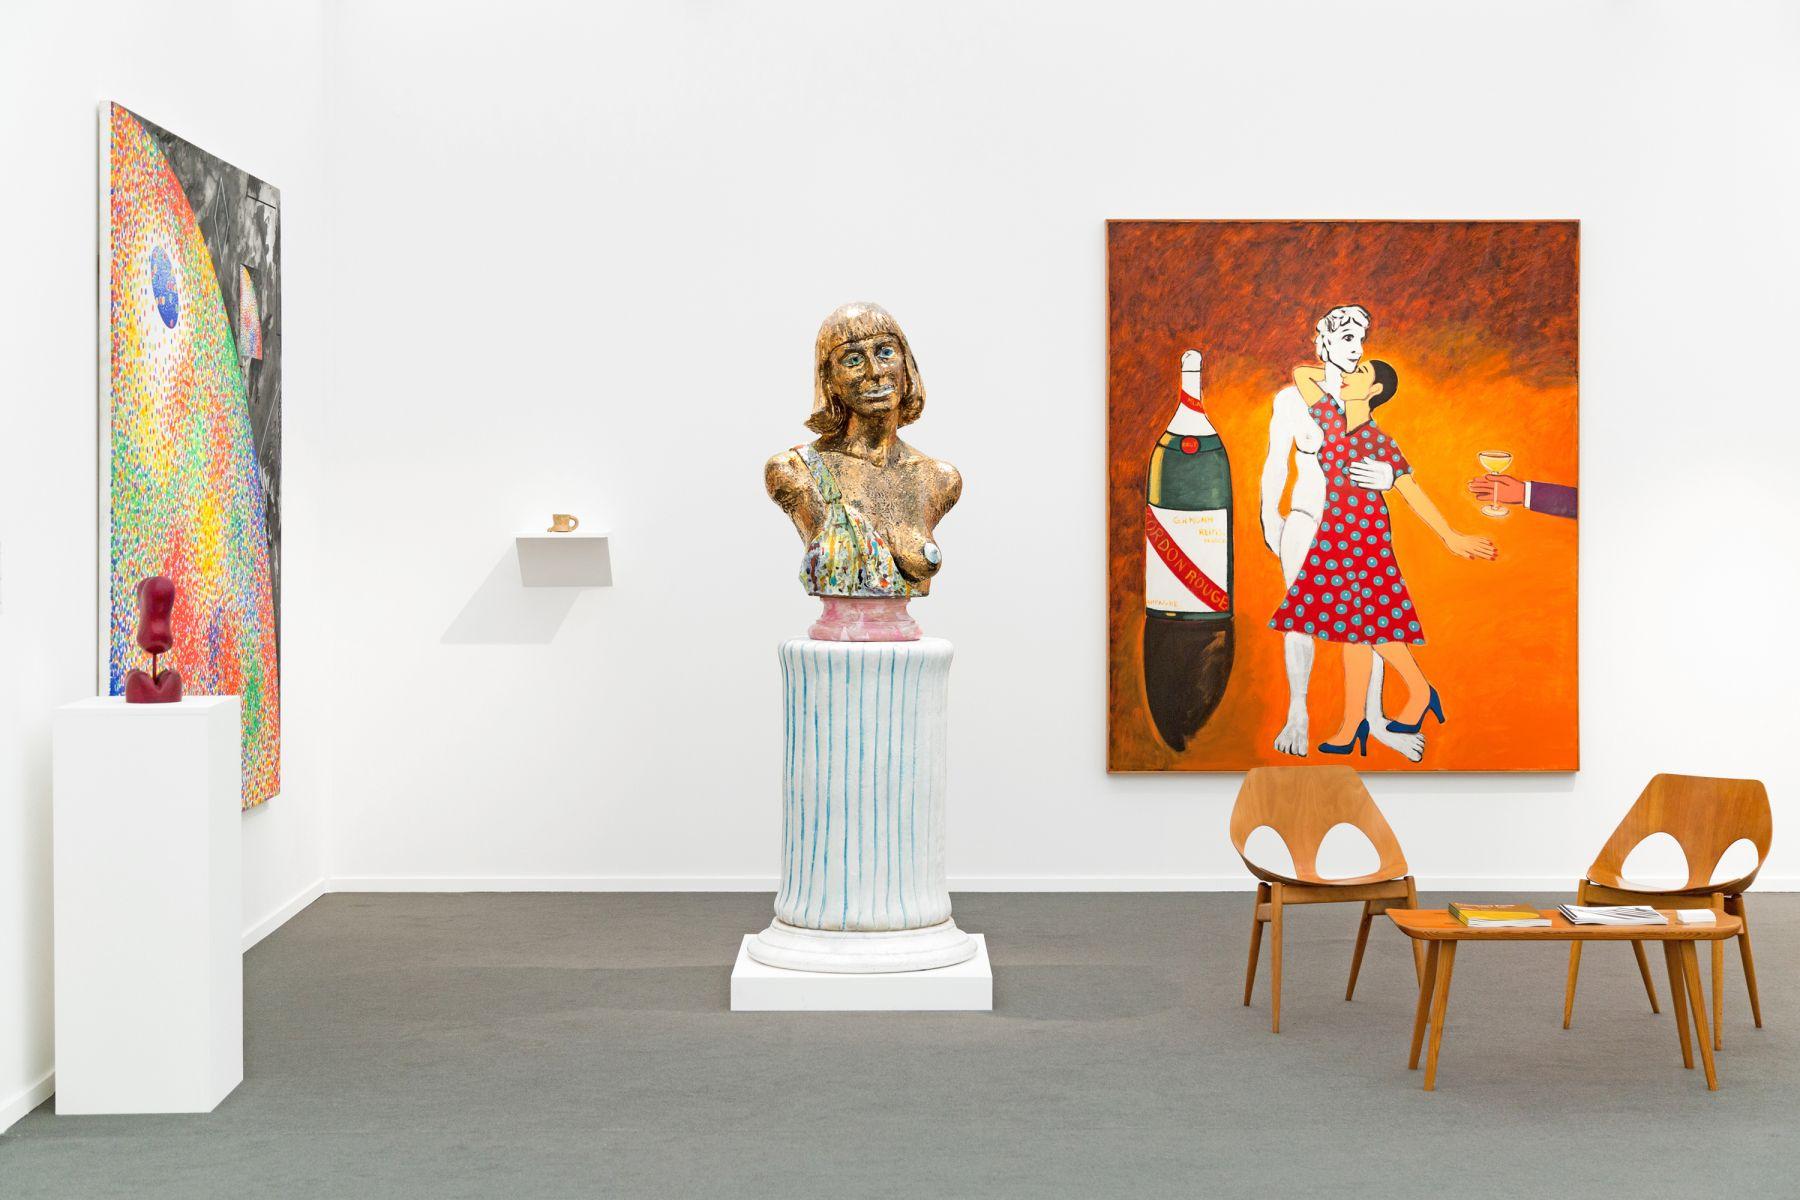 Installation view of Frumkin's Funk, Frieze Masters, London, 2018